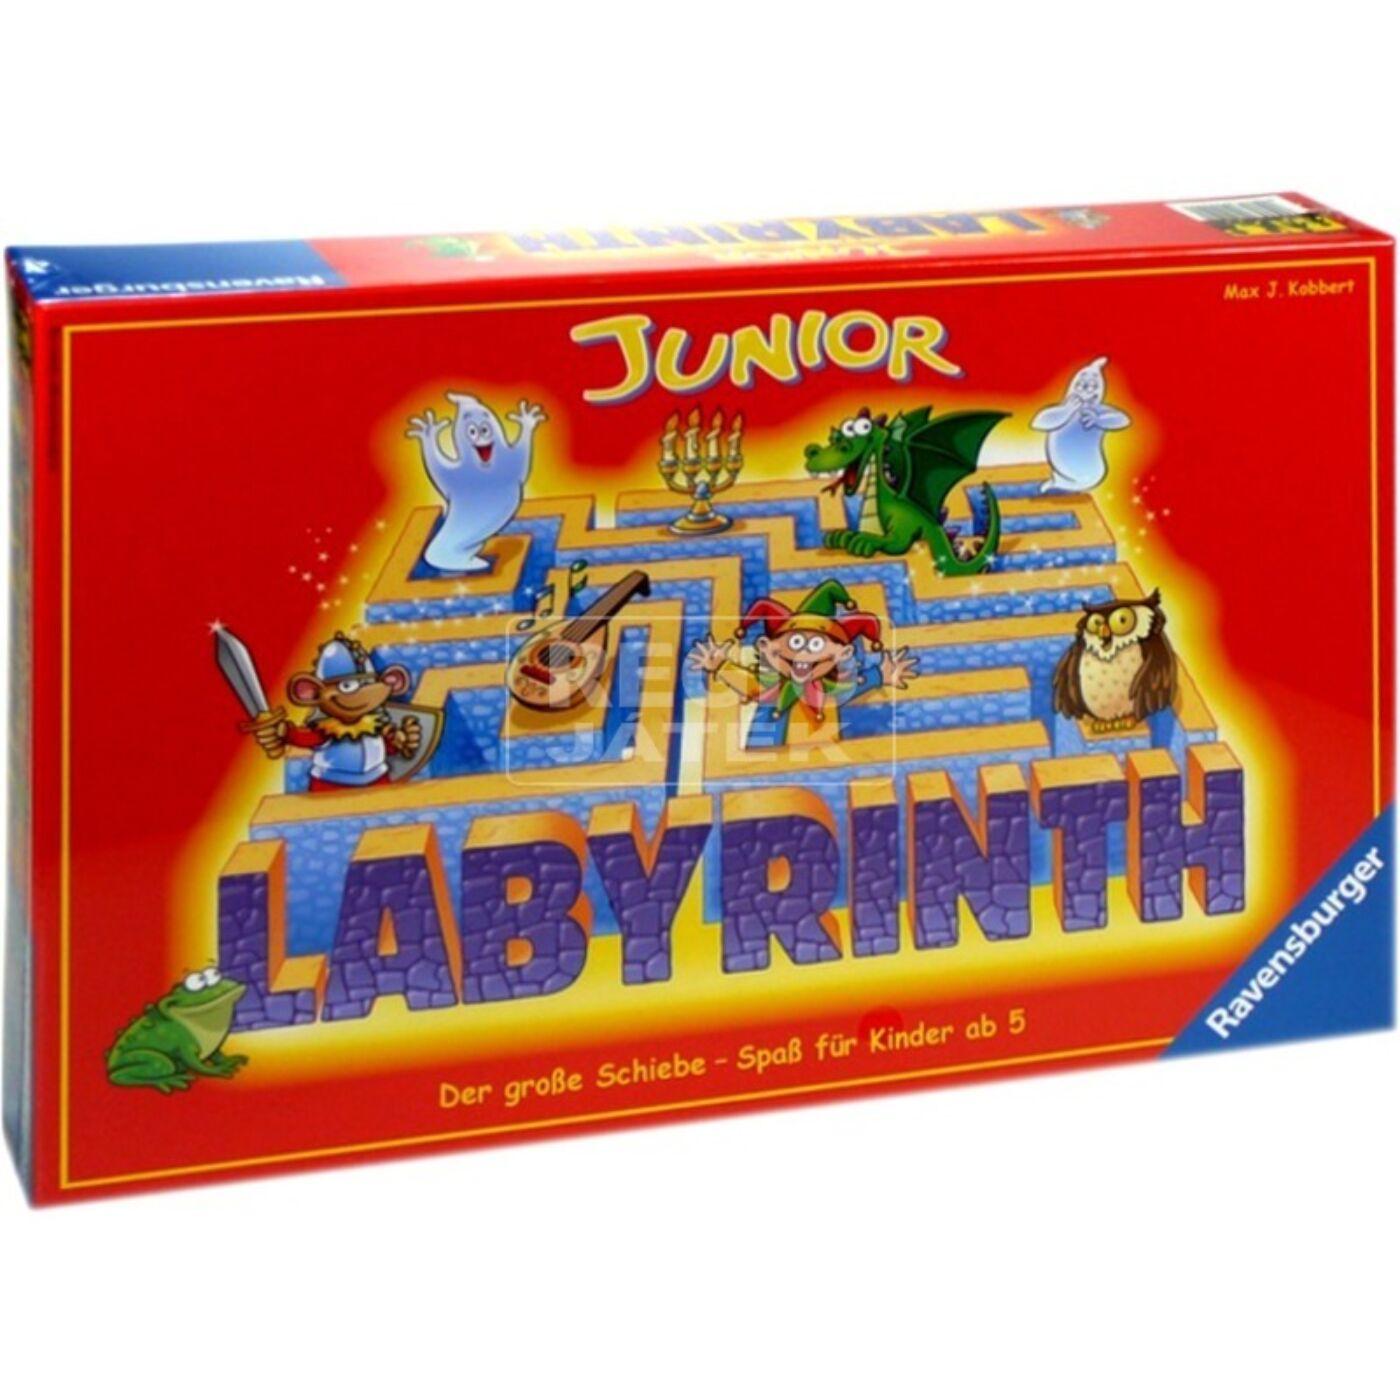 Labirintus junior